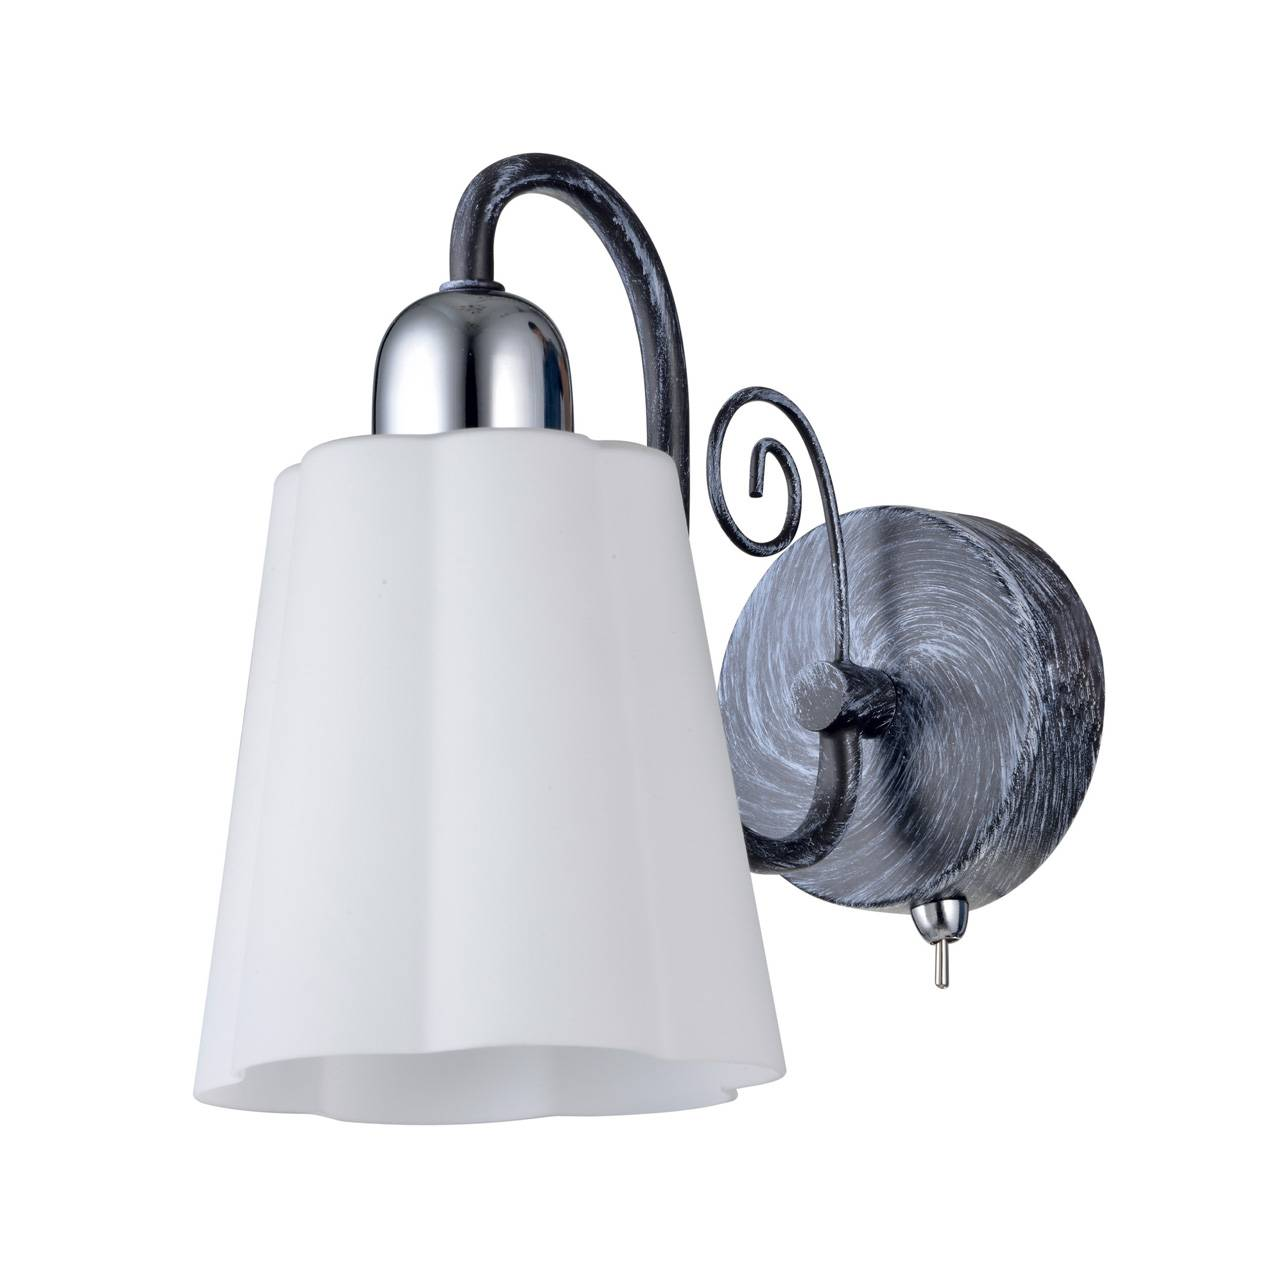 Бра IDLamp Rossella 847/1A-Blueglow бра idlamp 601 1a moondarkchrome